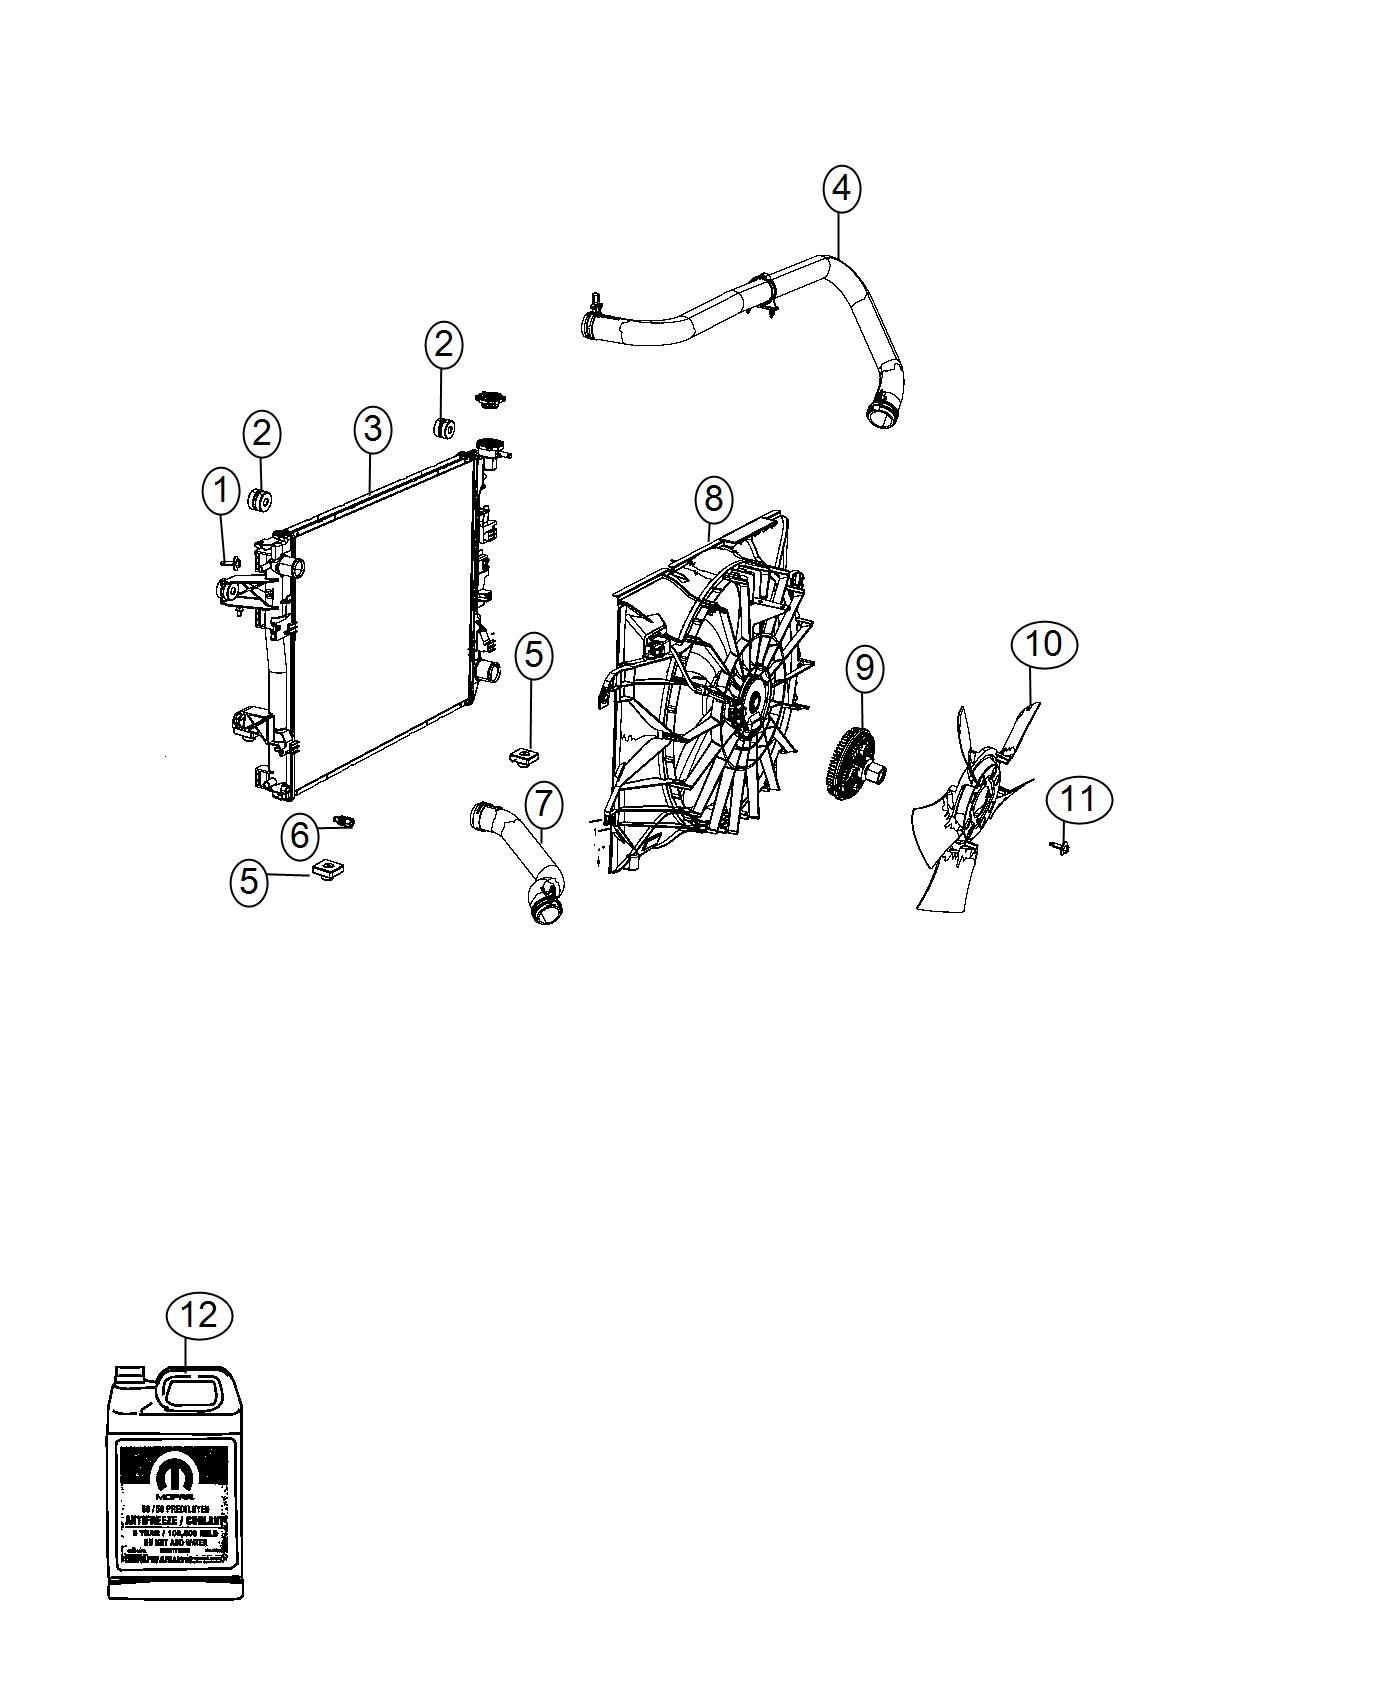 Ram Hose Radiator Outlet Includes Hoses